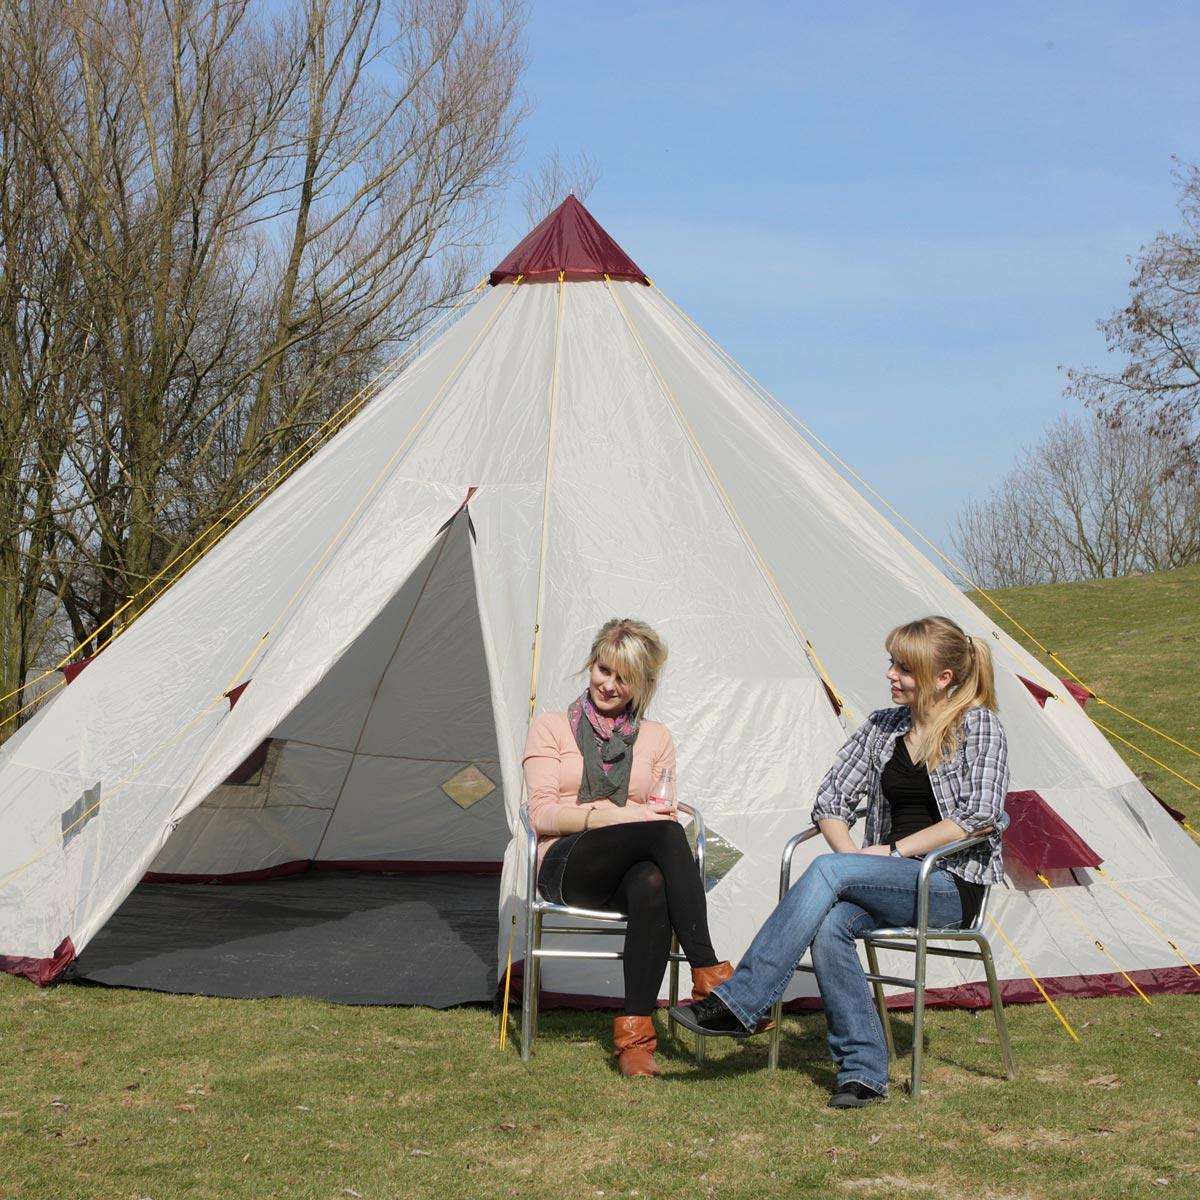 skandika tipii 300 wigwam zelt indianerzelt 2011 neu chf picclick ch. Black Bedroom Furniture Sets. Home Design Ideas